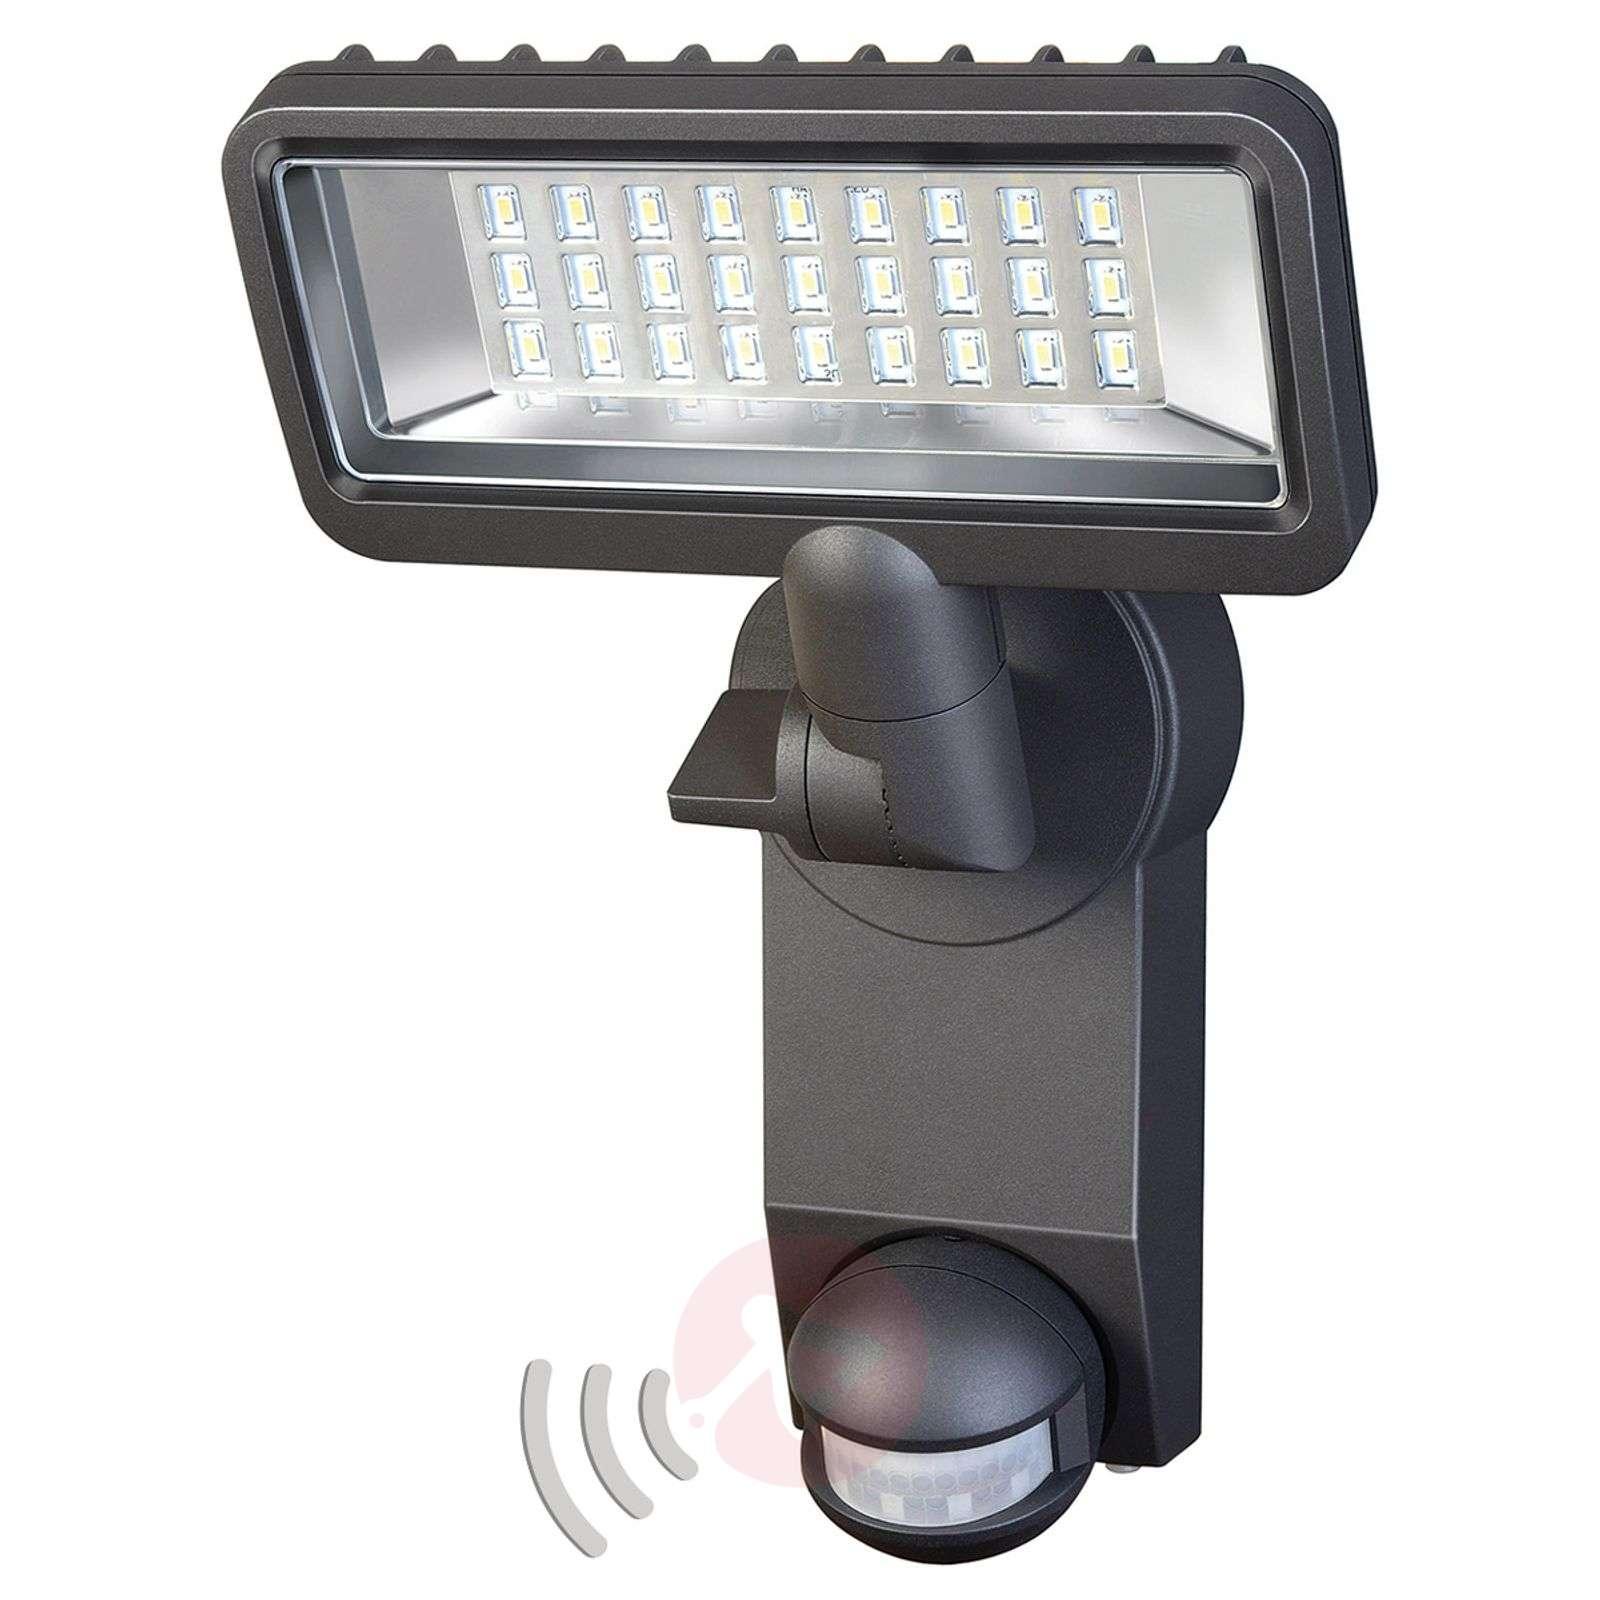 Sis. liiketunnistimen – City-LED-ulkovalonheitin-1540156-01